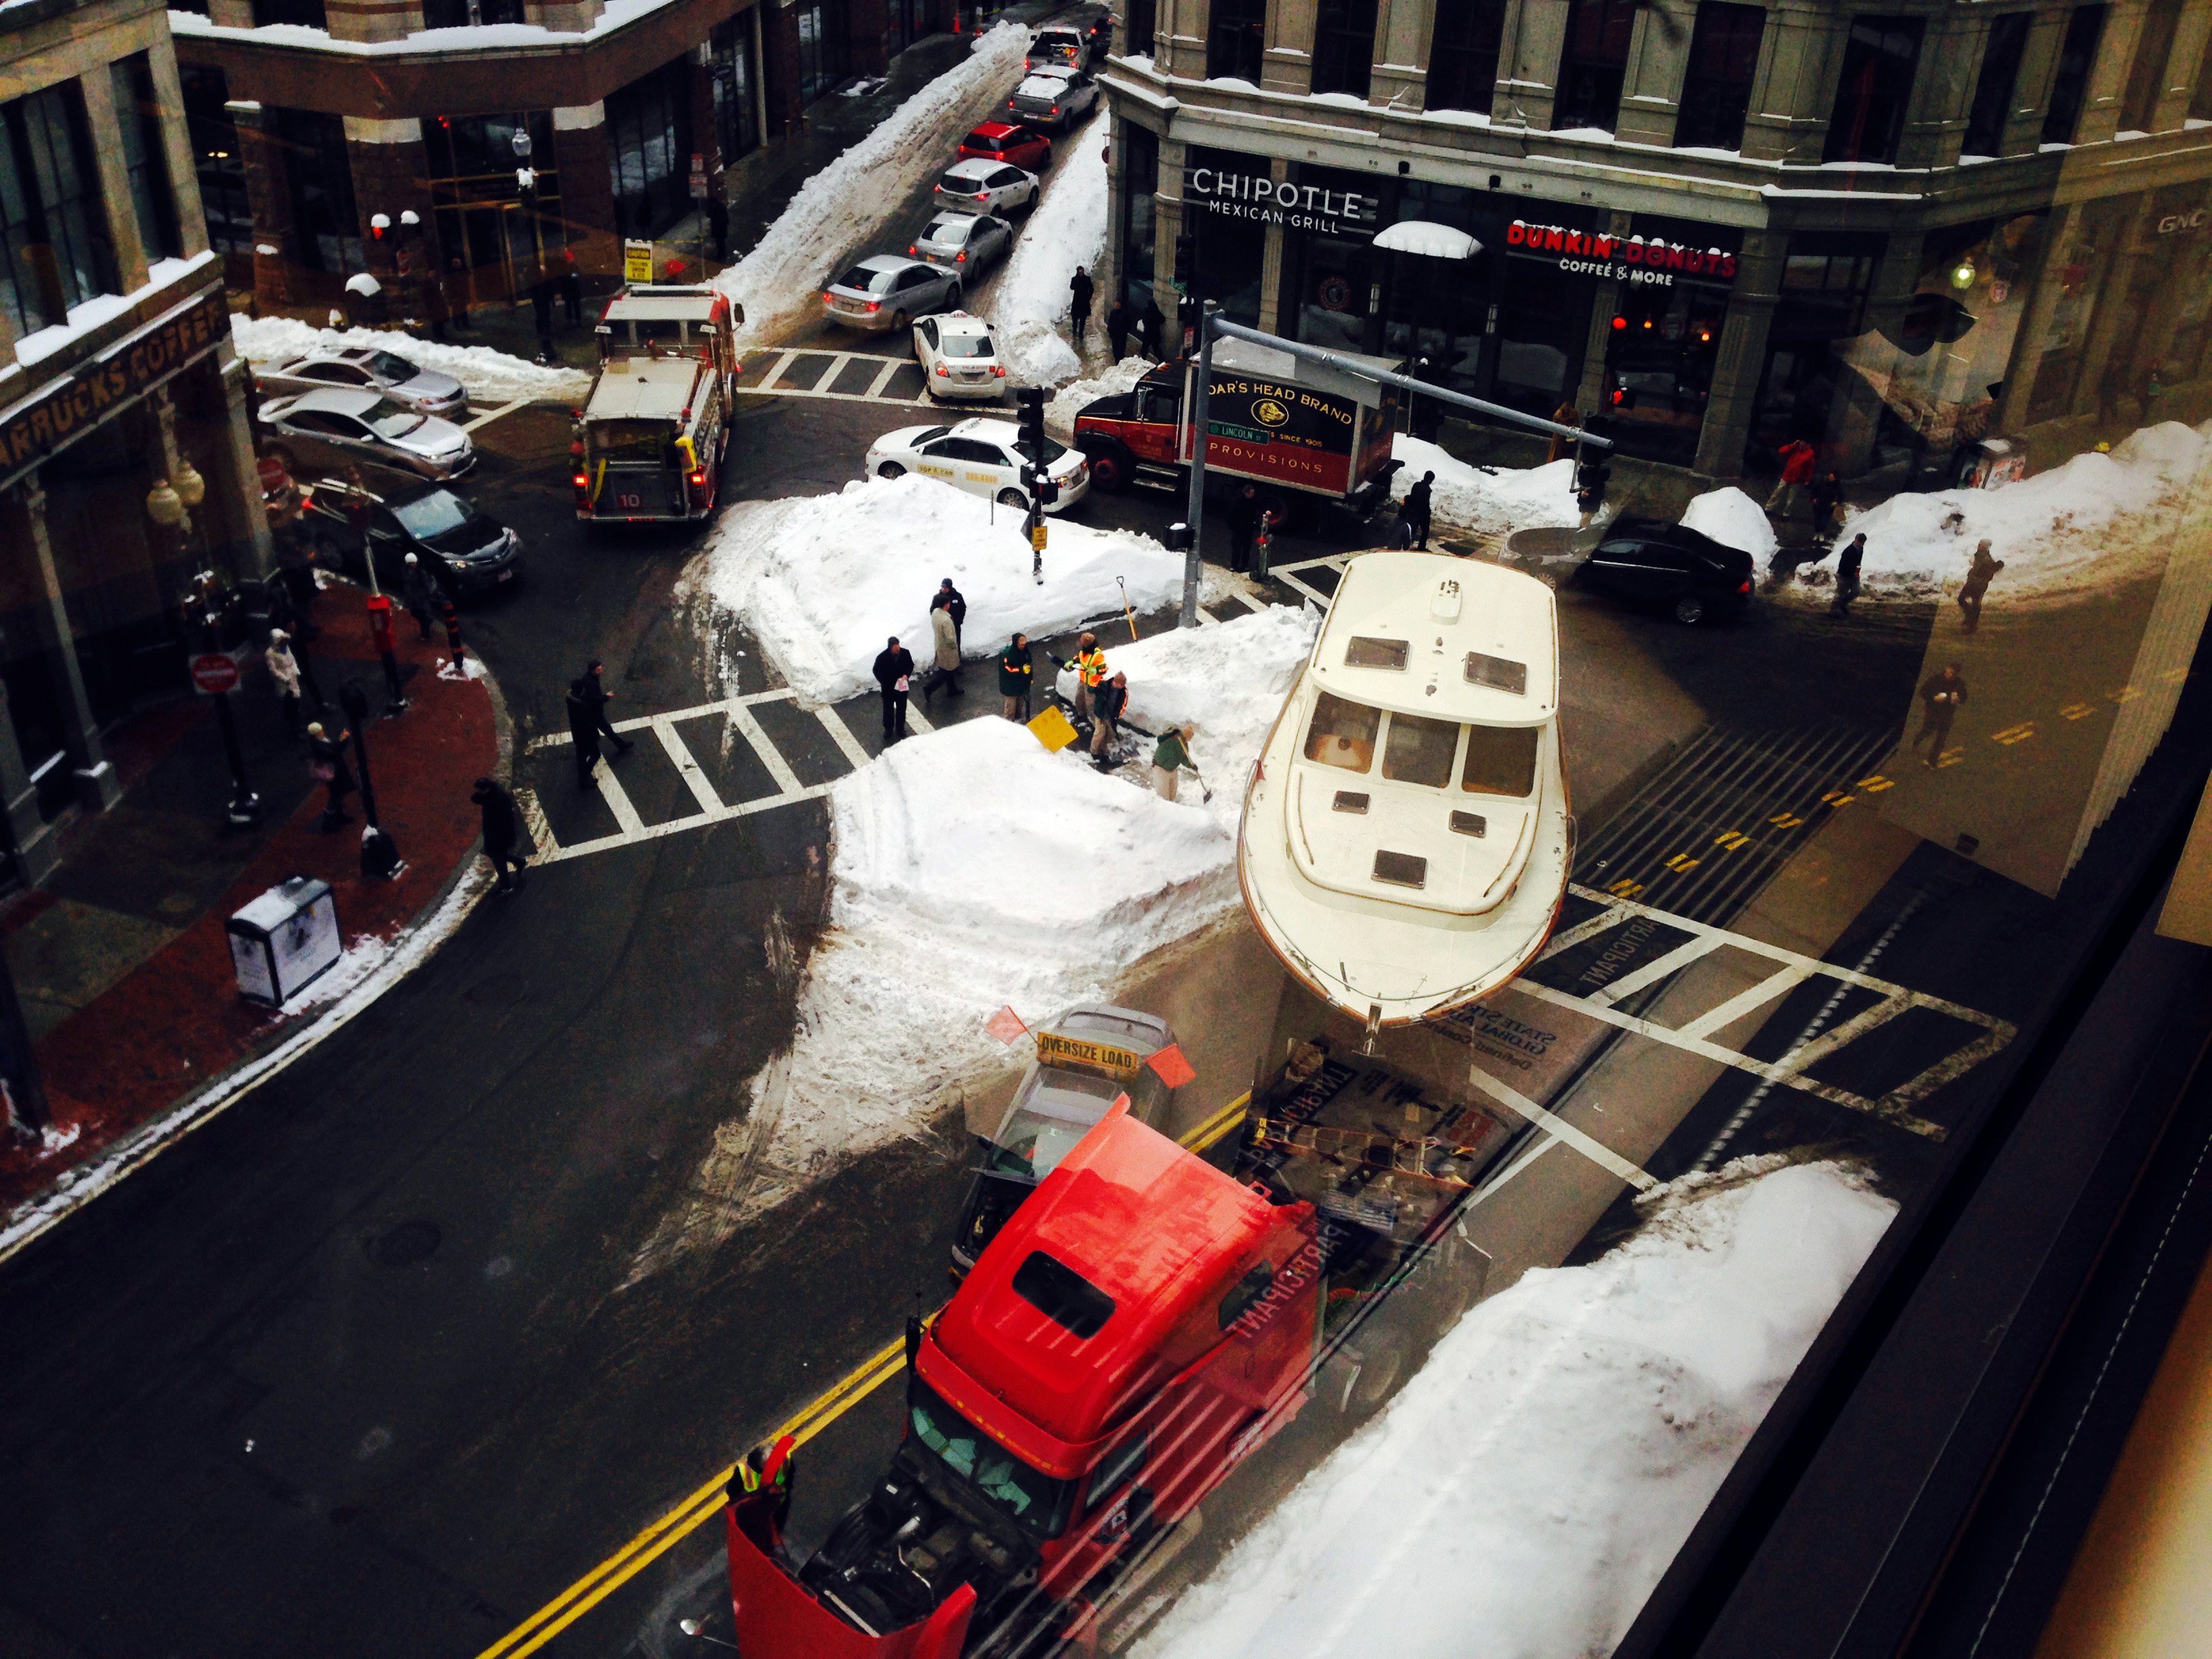 Boston - 36-Foot Yacht Blocks Traffic In Snow-Clogged Downtown